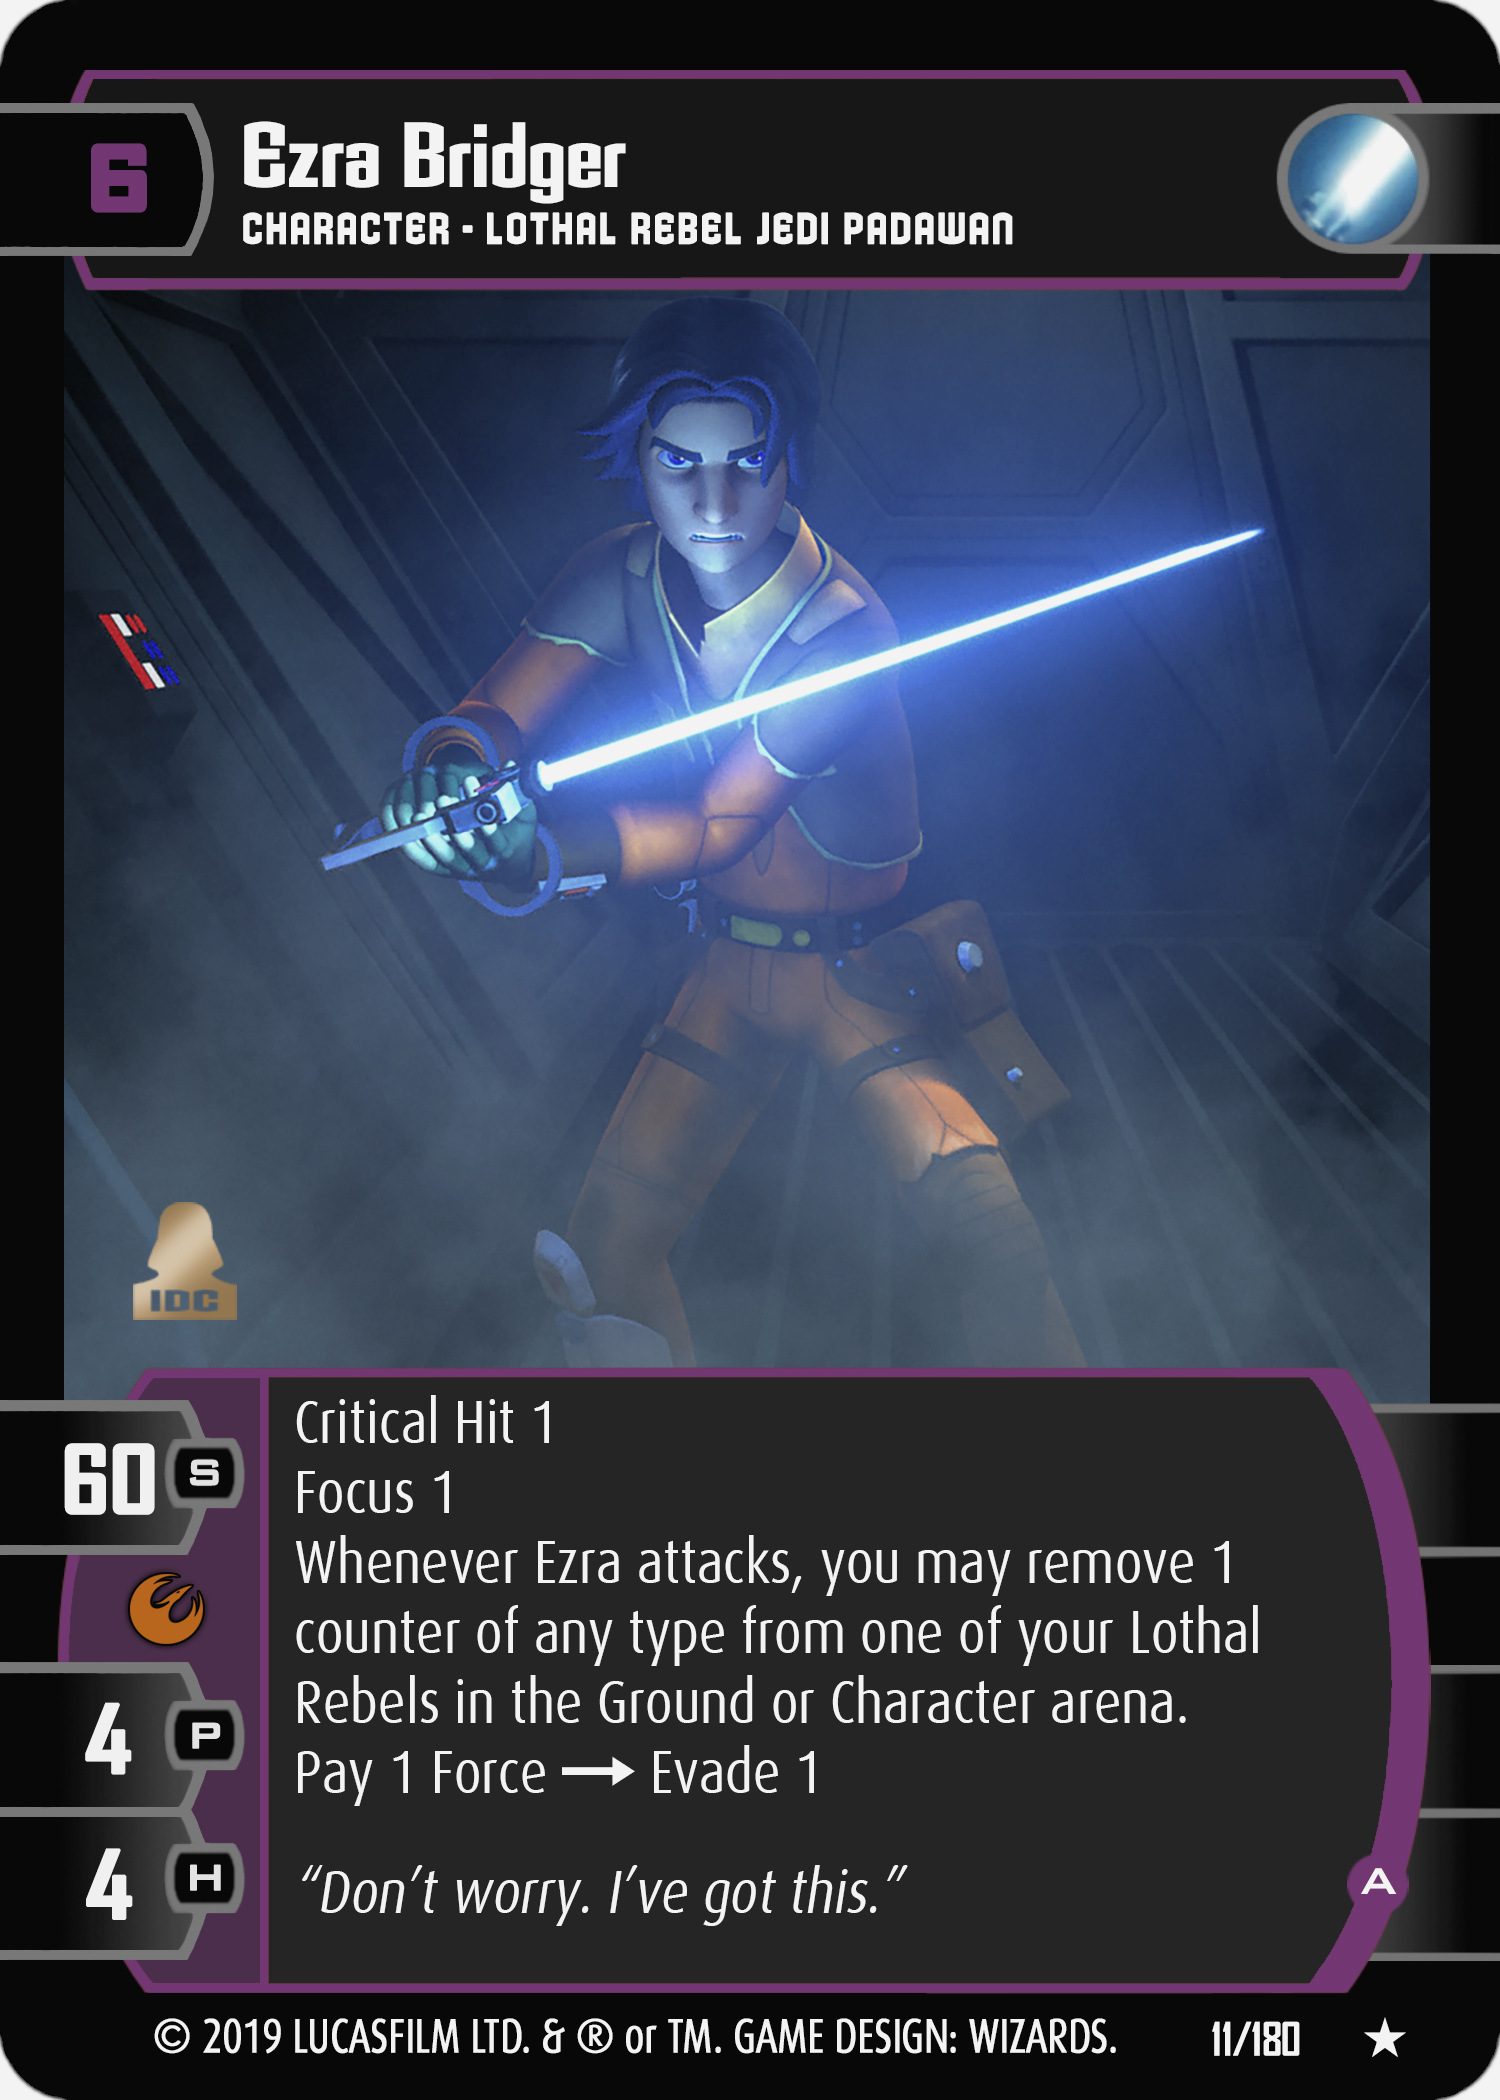 Star Wars Young Jedi  ccg Jedi Council